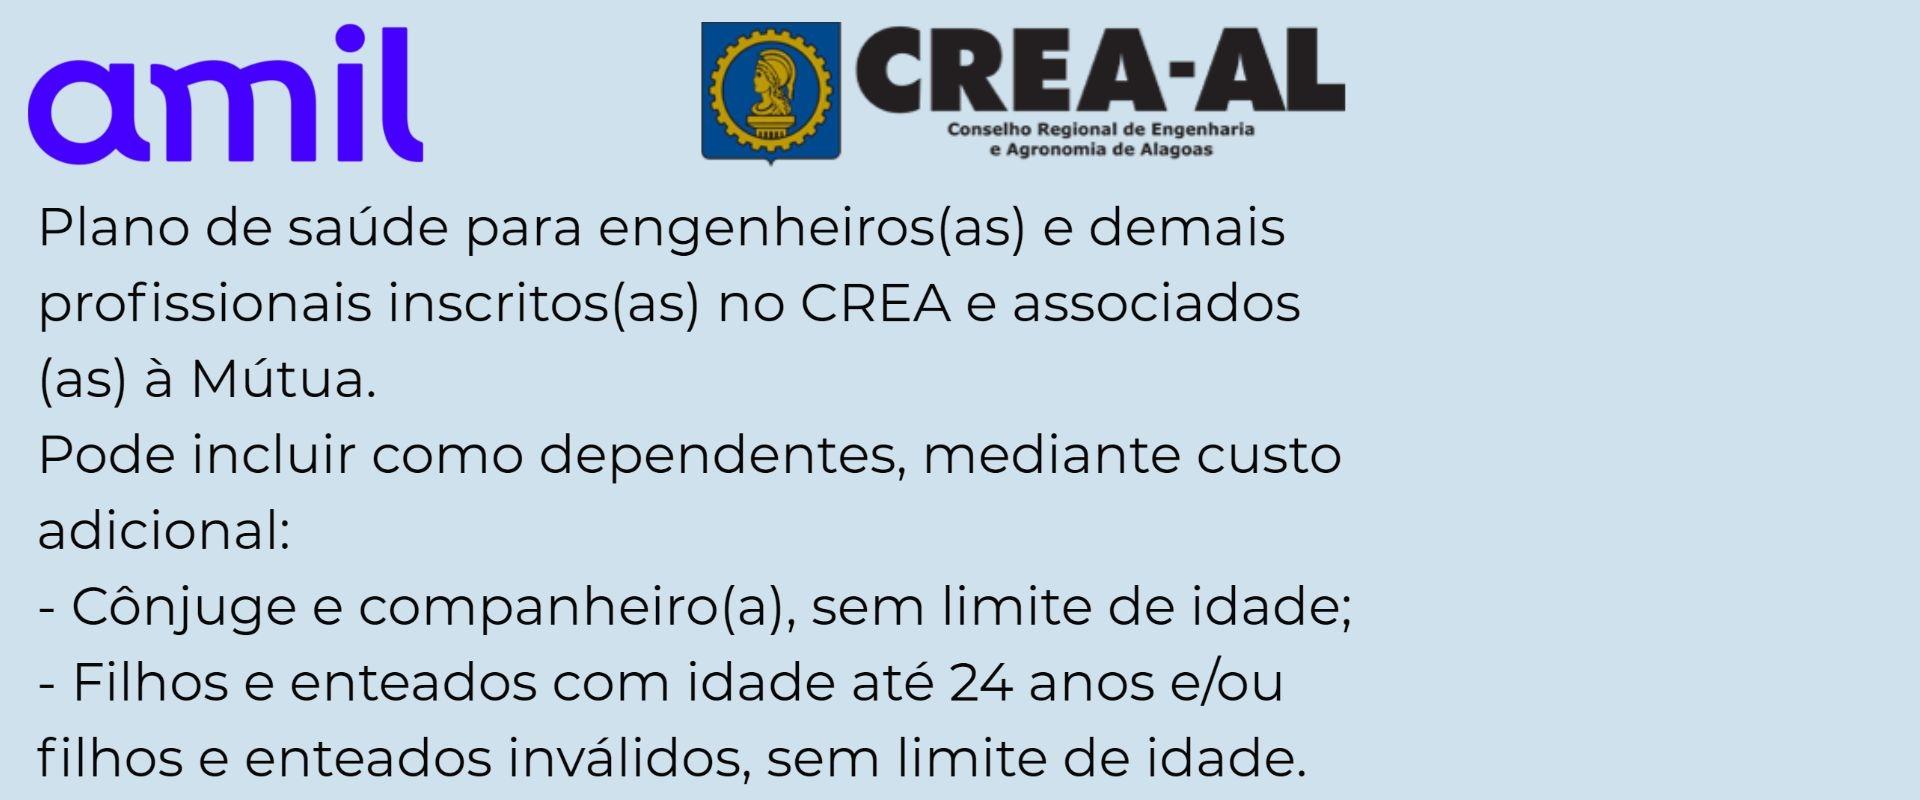 Amil CREA-AL